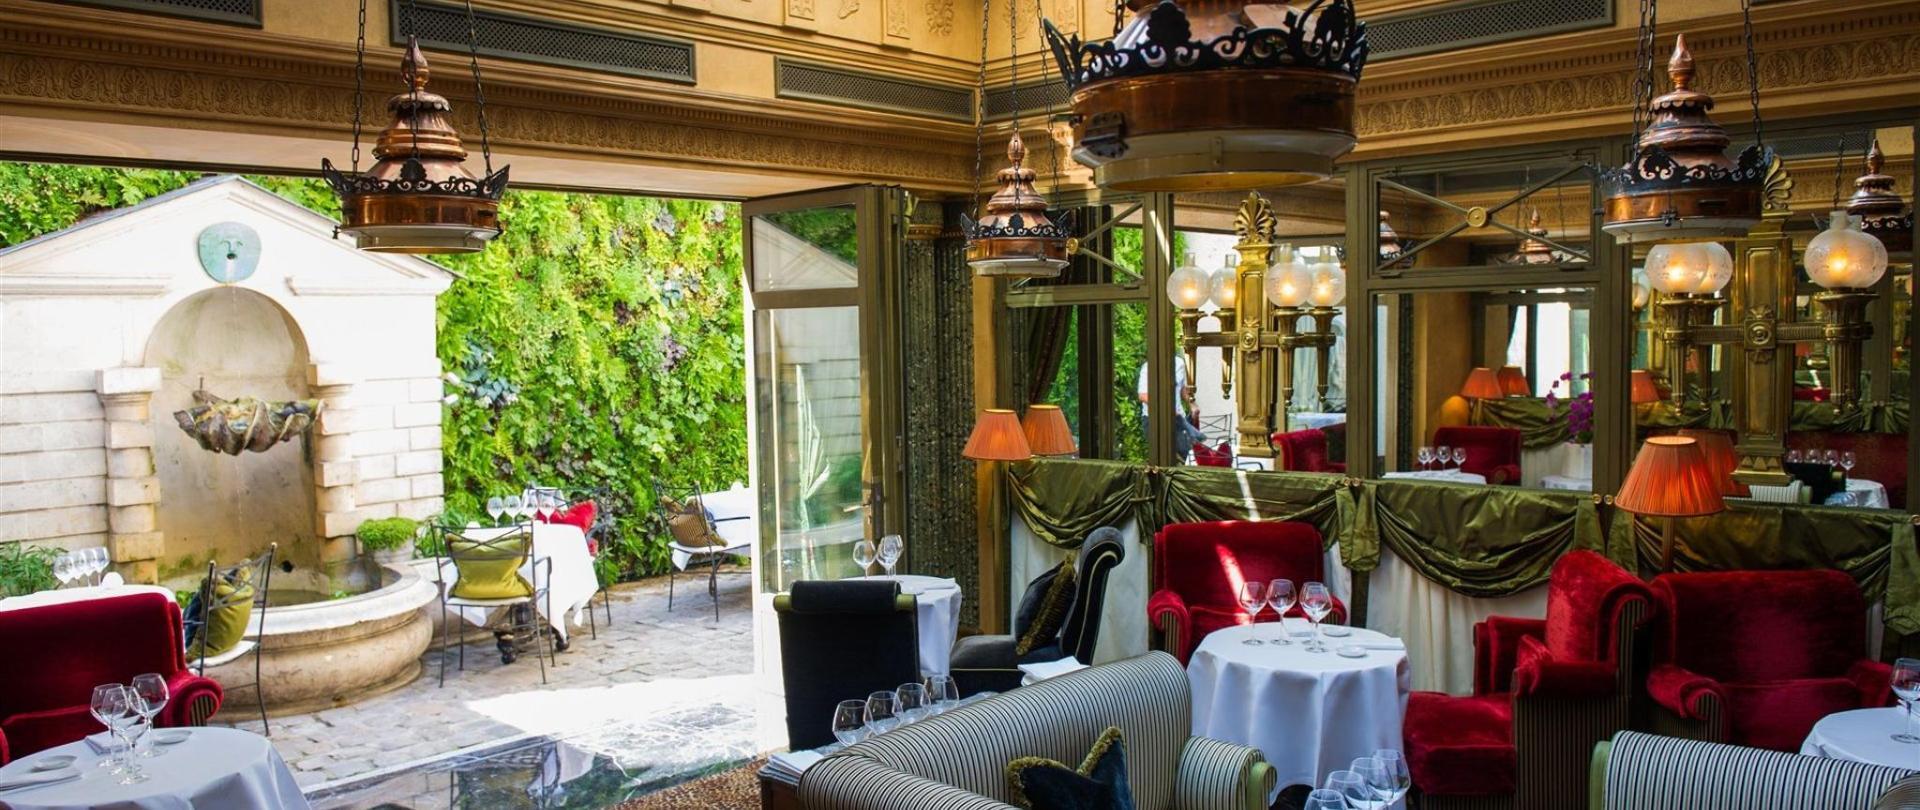 Le Restaurant L'Hotel.jpg